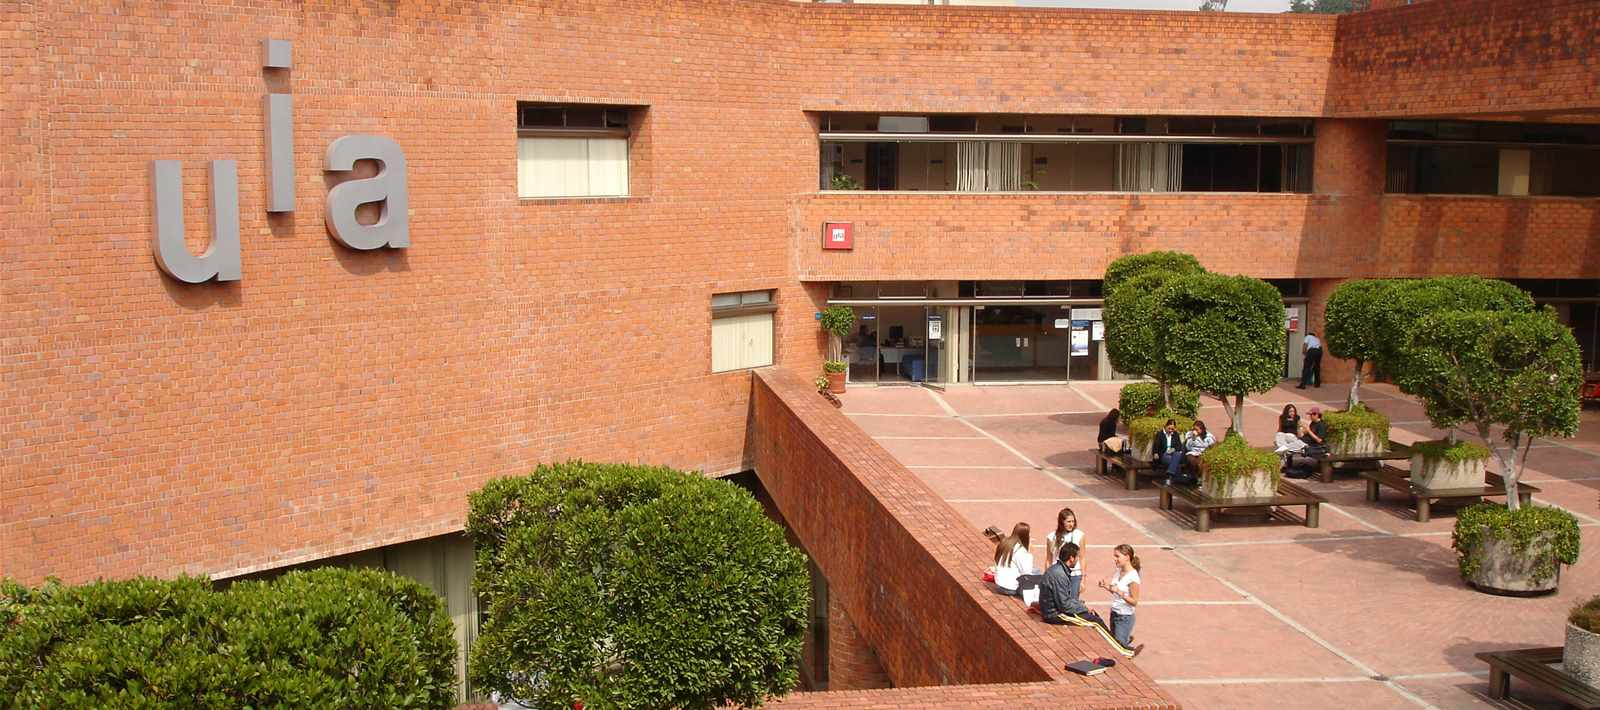 Universidad Iberoamericana (IBERO)